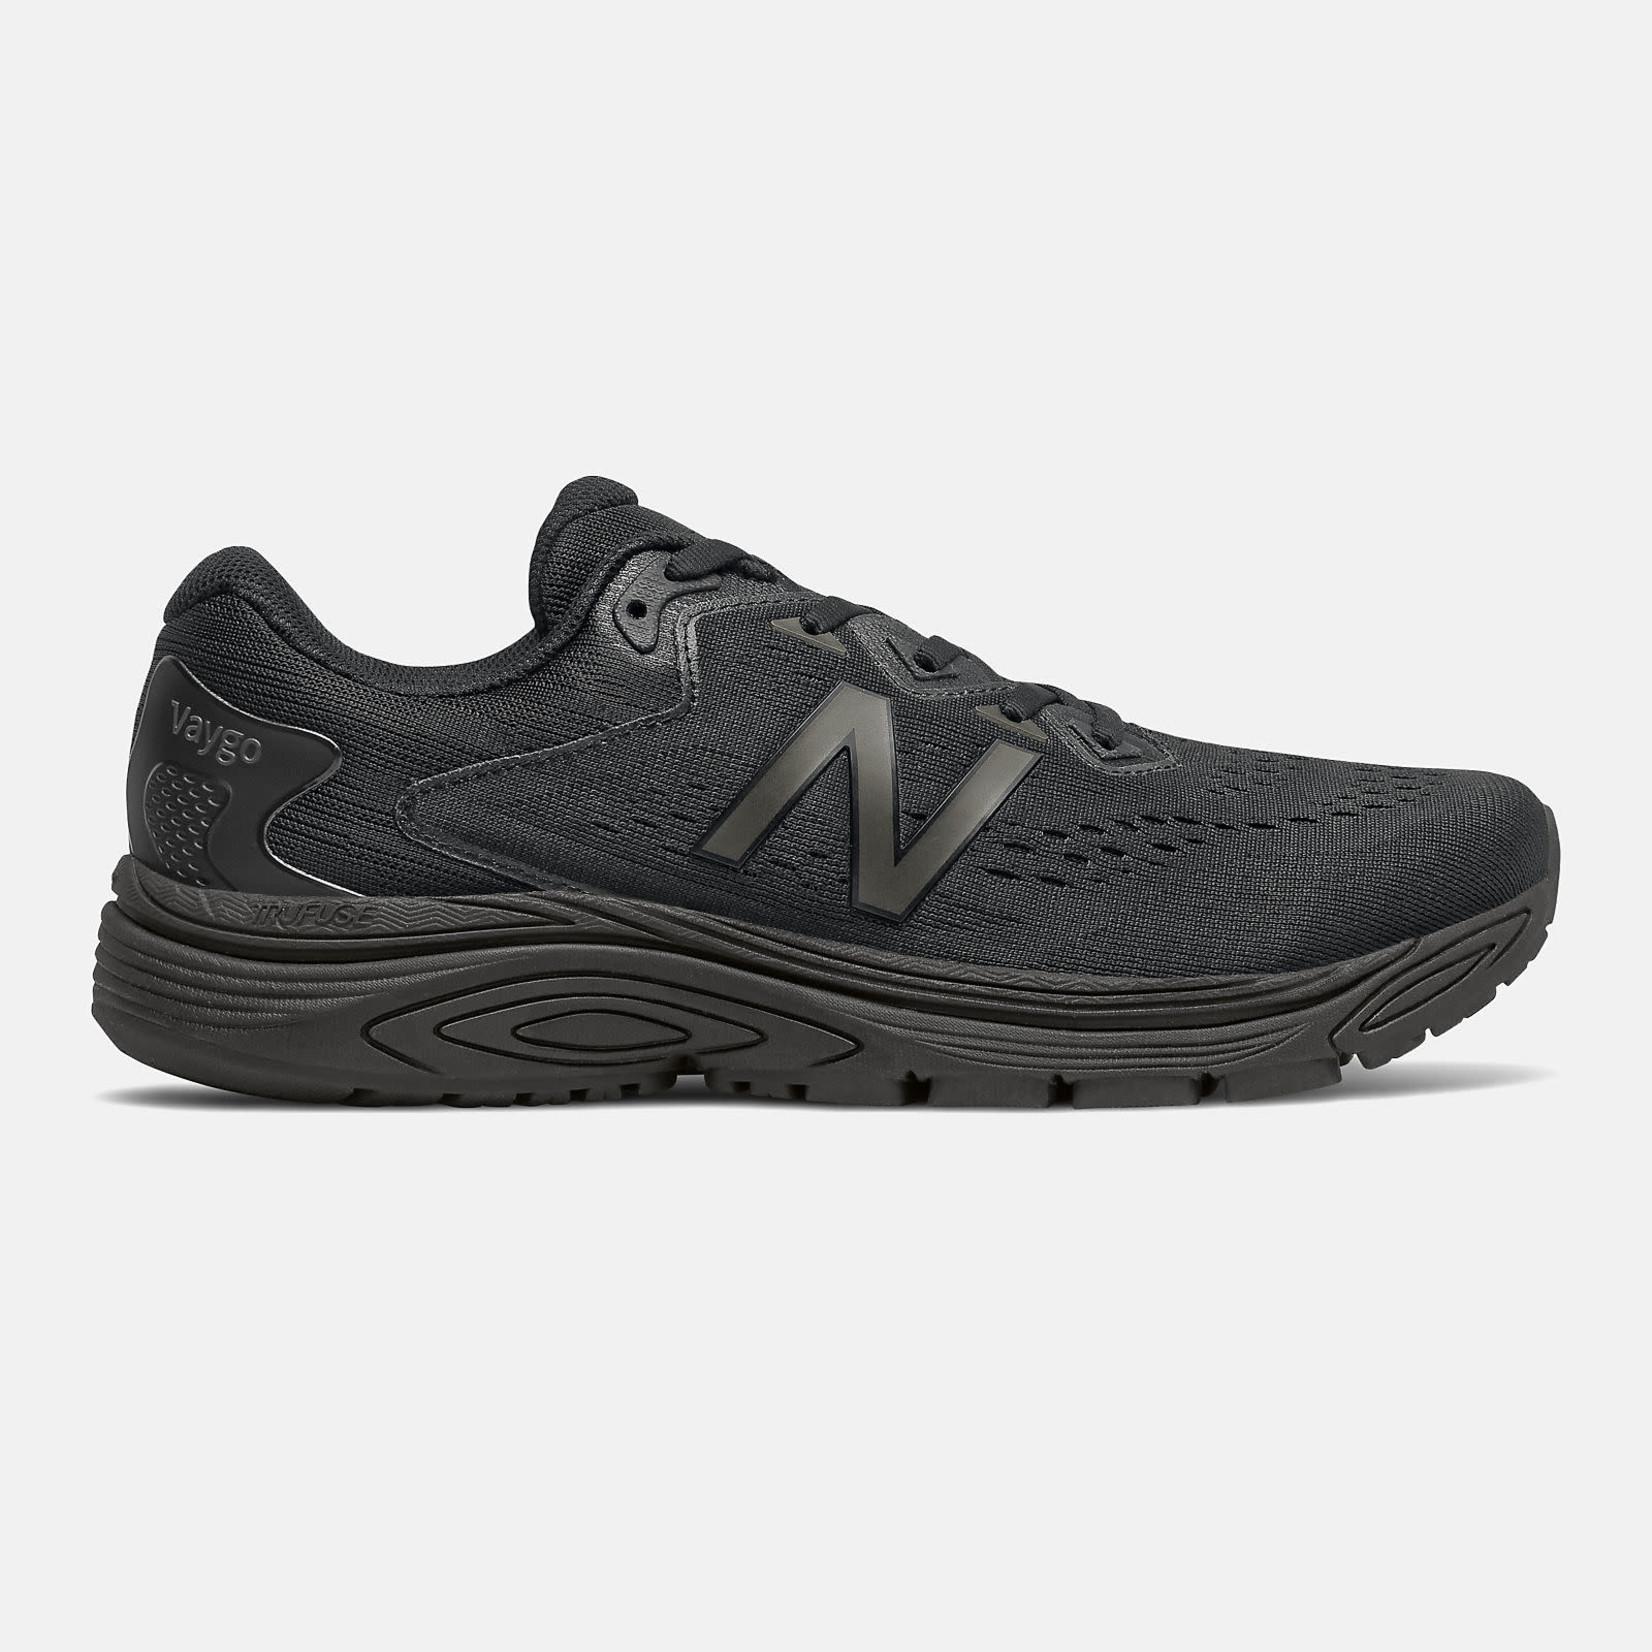 New Balance New Balance Running Shoes, MVYGOCB, Mens